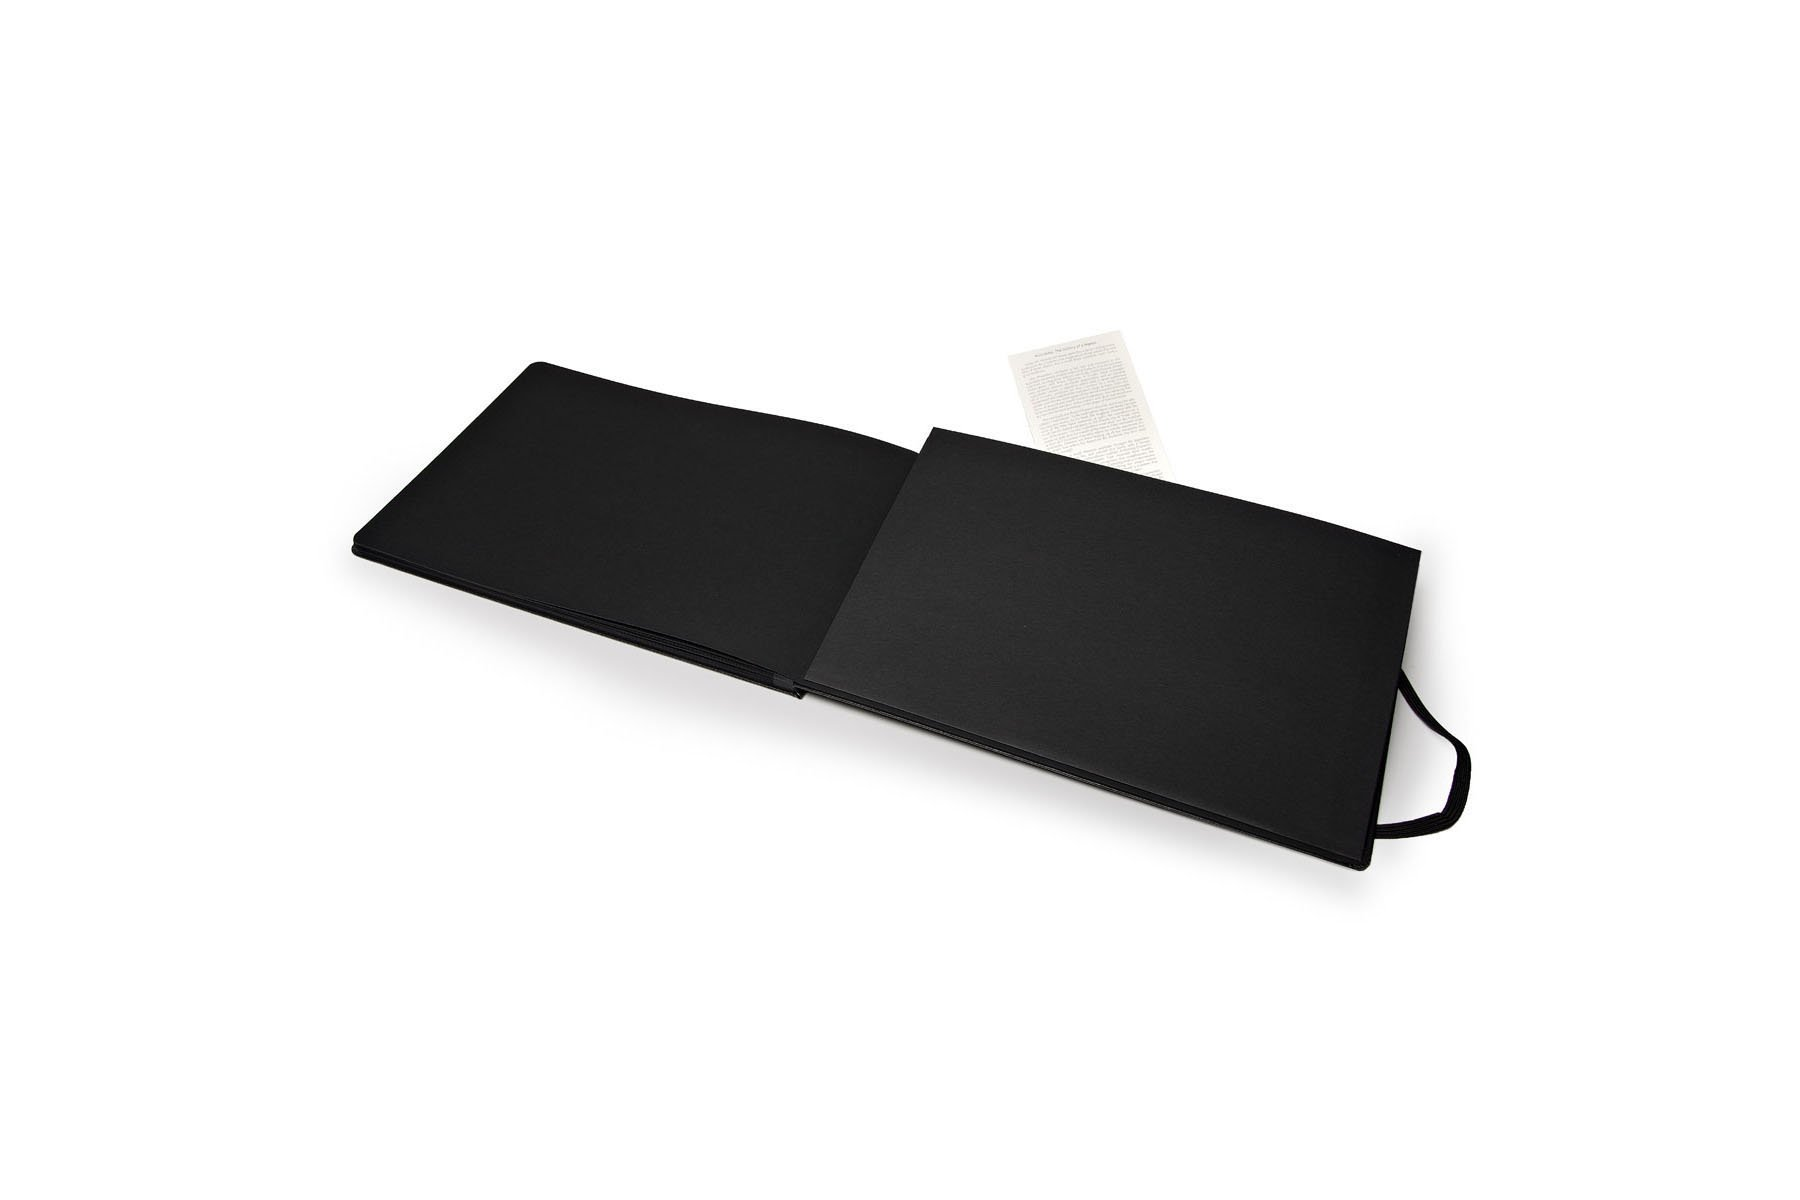 Moleskine Art Black Page Album Hard Cover A4 8 25 X 11 75 Plain Blank Black